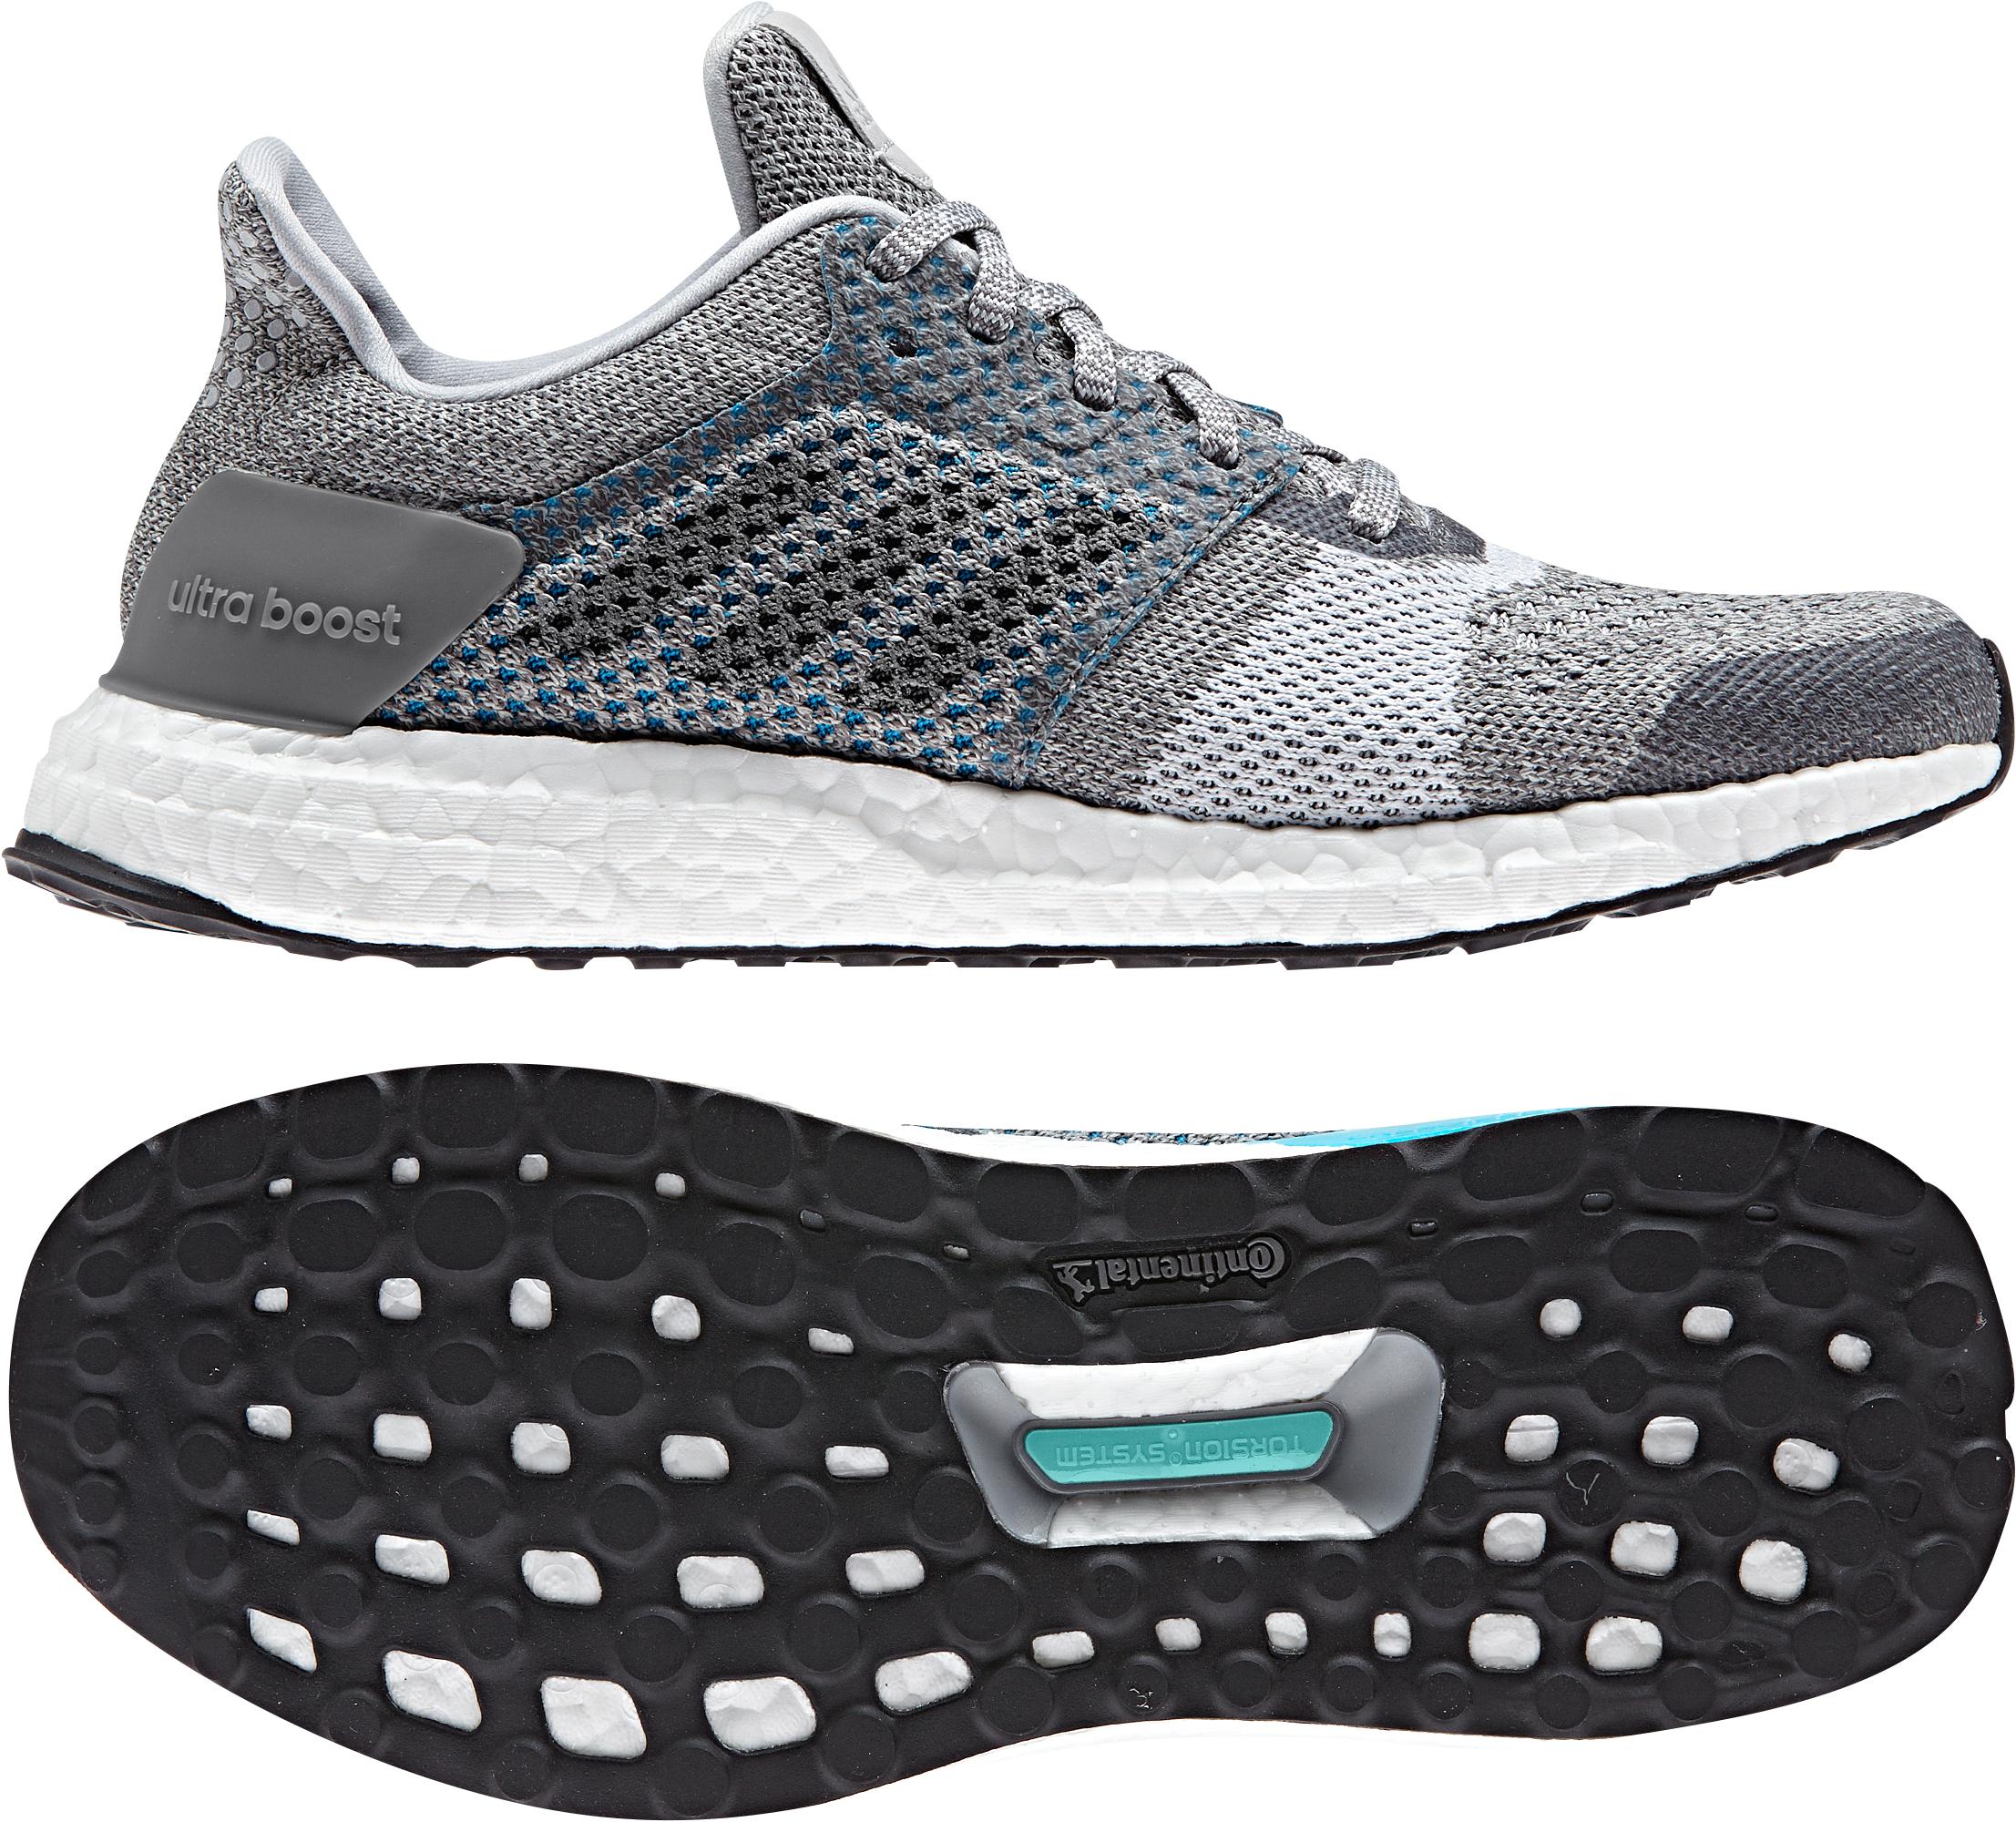 a419e0ef0187b Adidas Ultra Boost ST Road Running Shoes - Women s